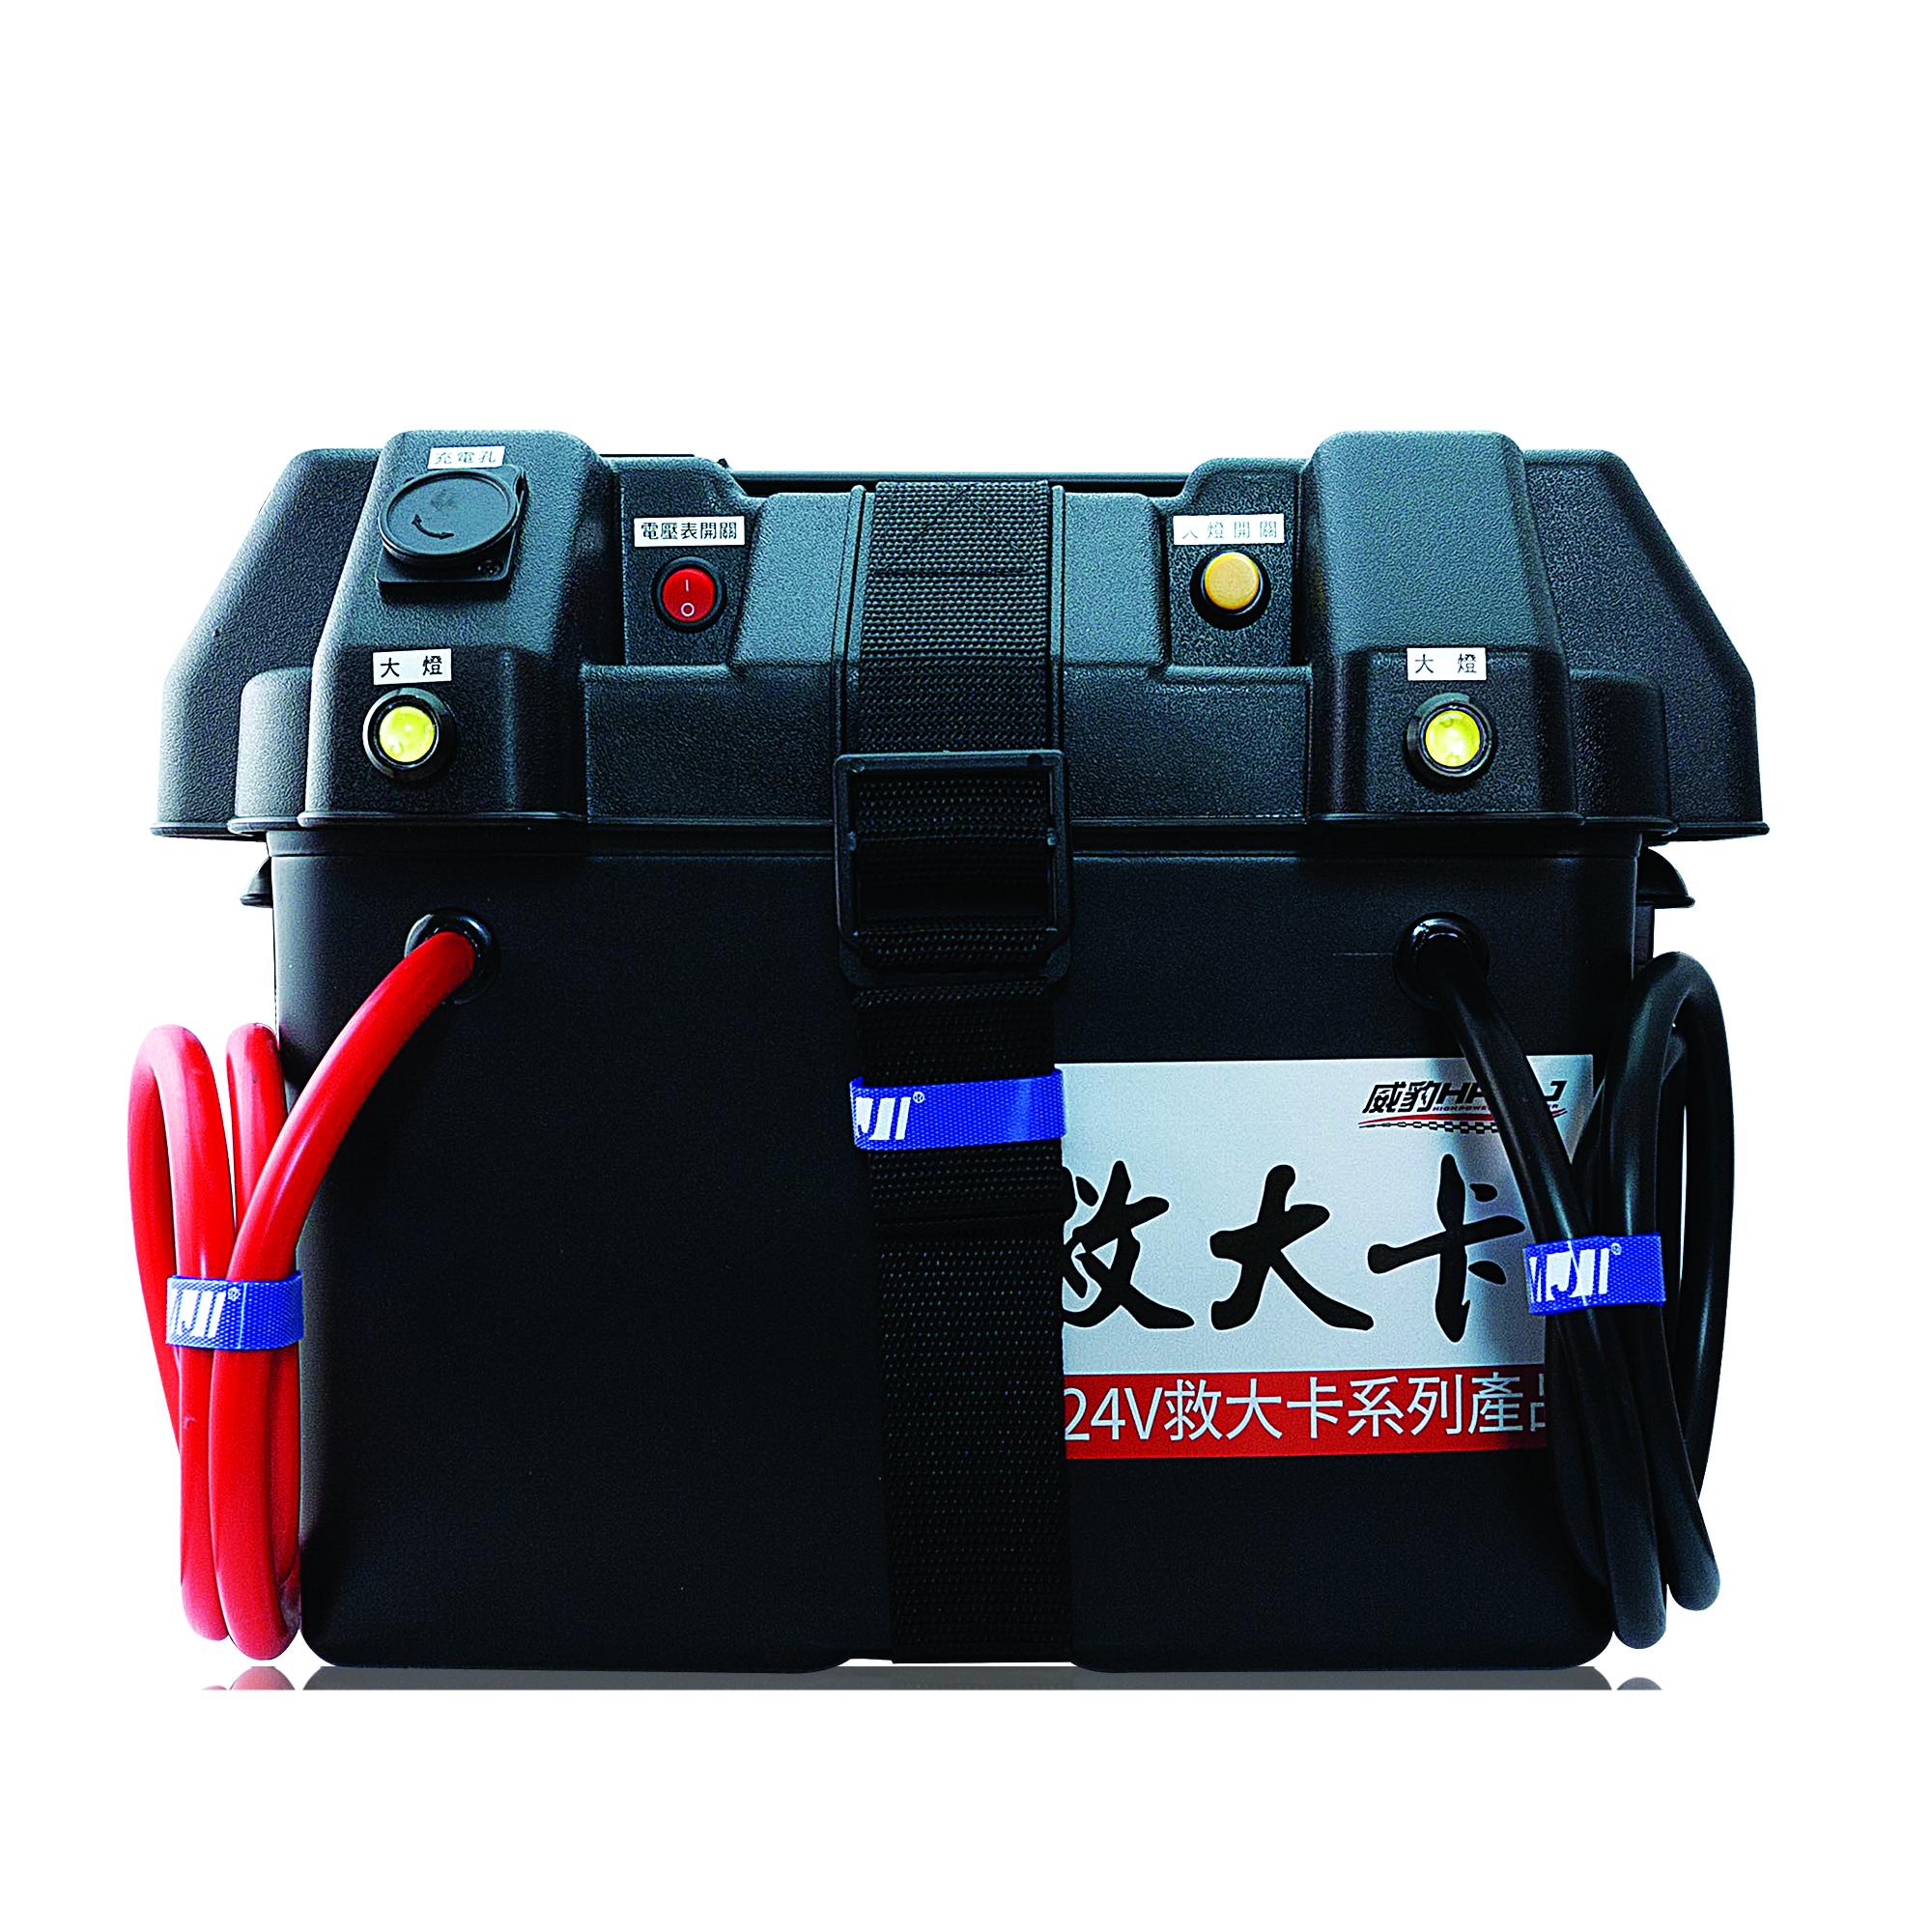 12+24V大型車救援/行動備用電源/汽車救援電源